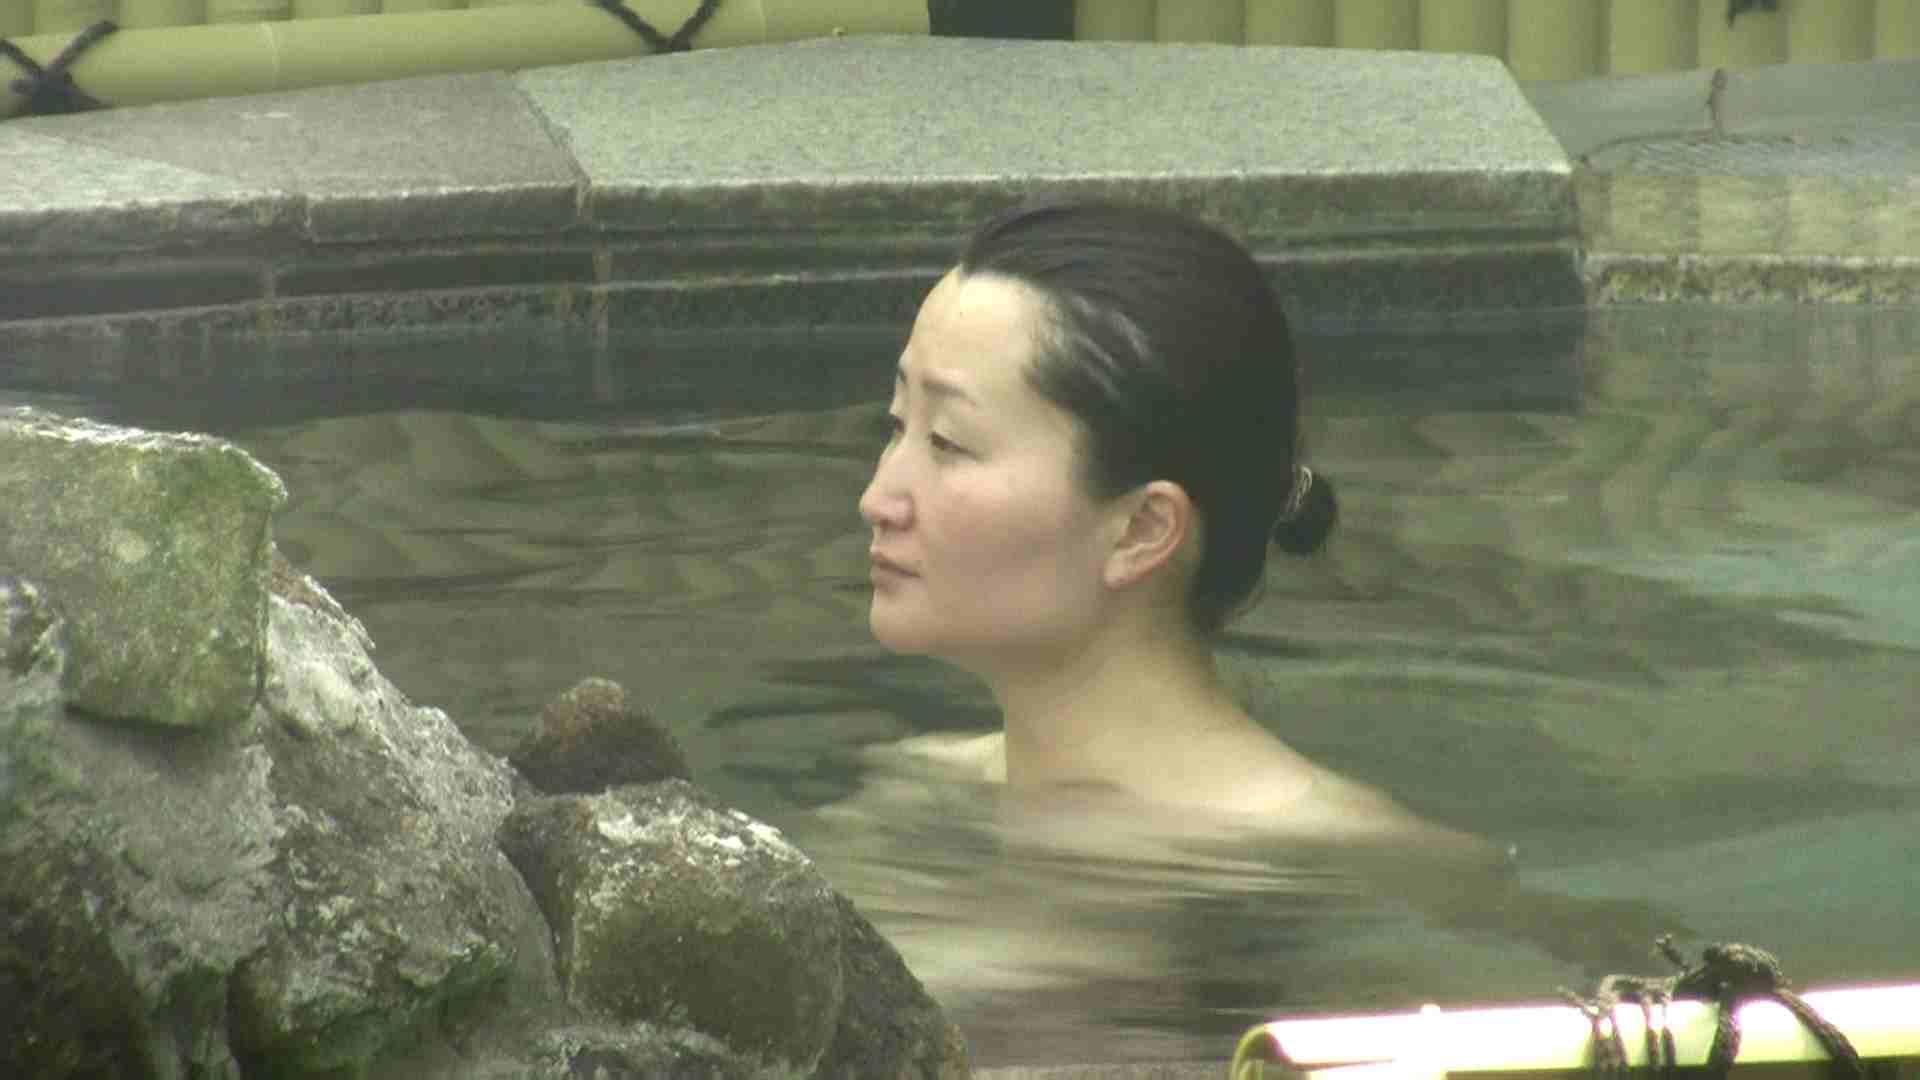 Aquaな露天風呂Vol.632 盗撮 | OLエロ画像  41PICs 25